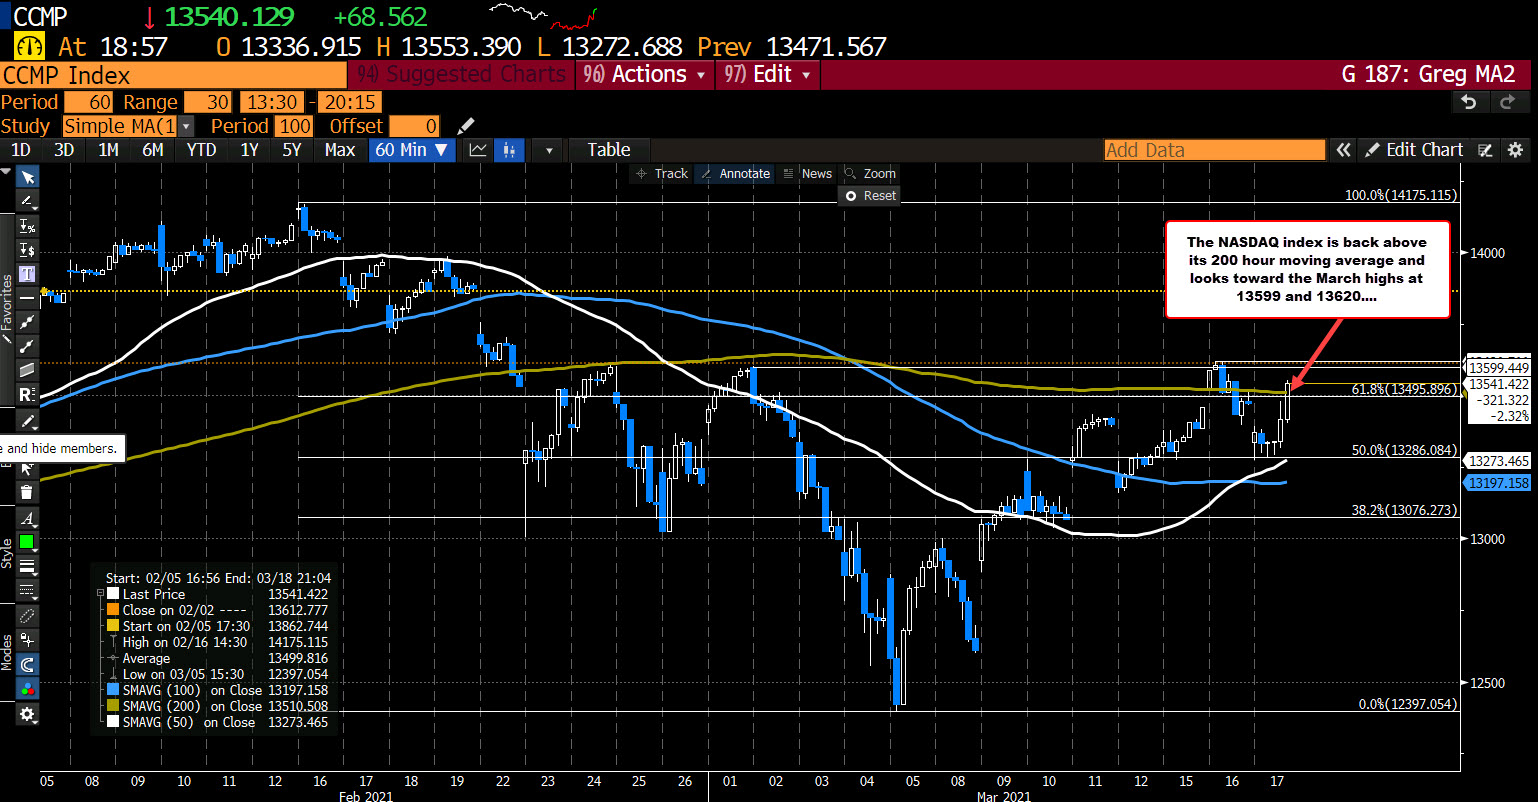 NASDAQ index back above its 200 hour moving average